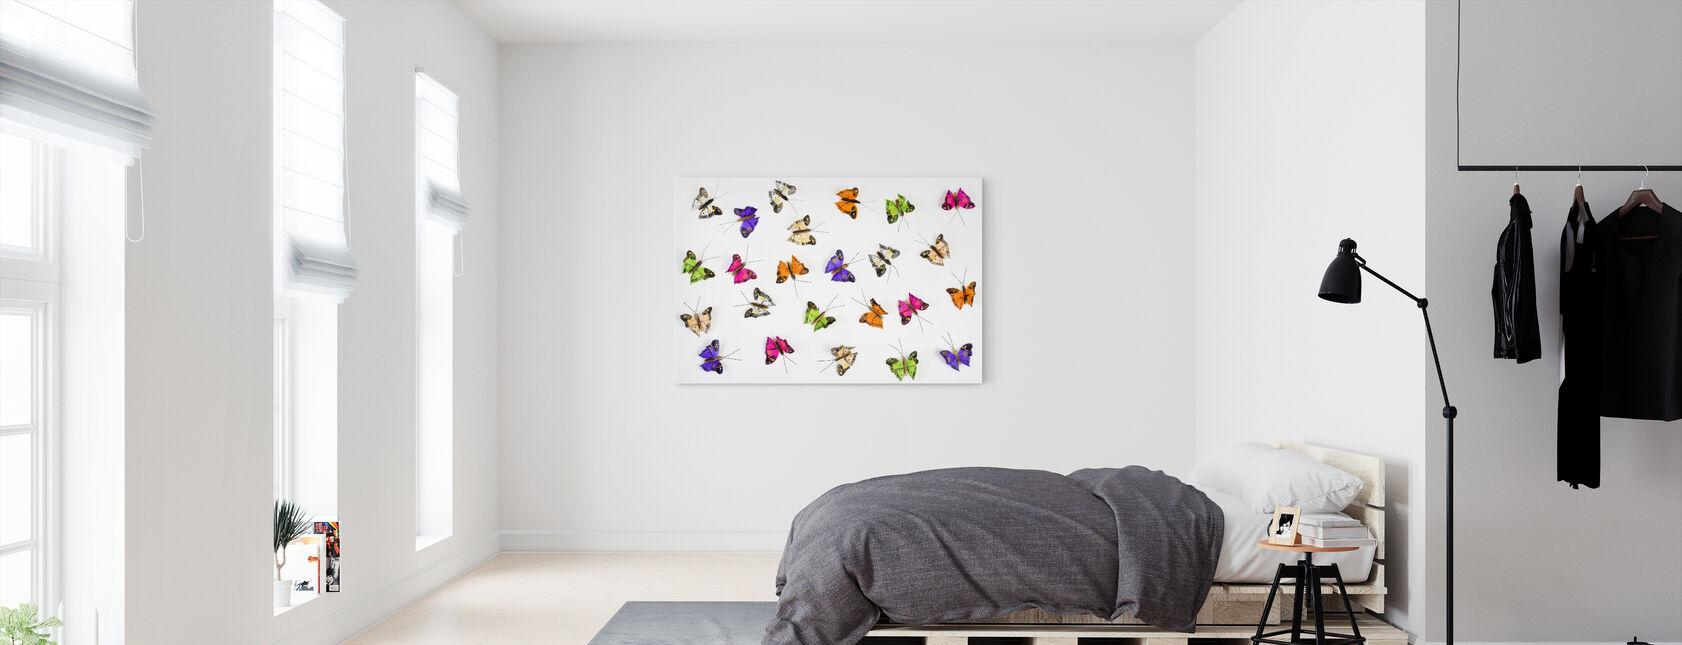 Fjärilar - Canvastavla - Sovrum